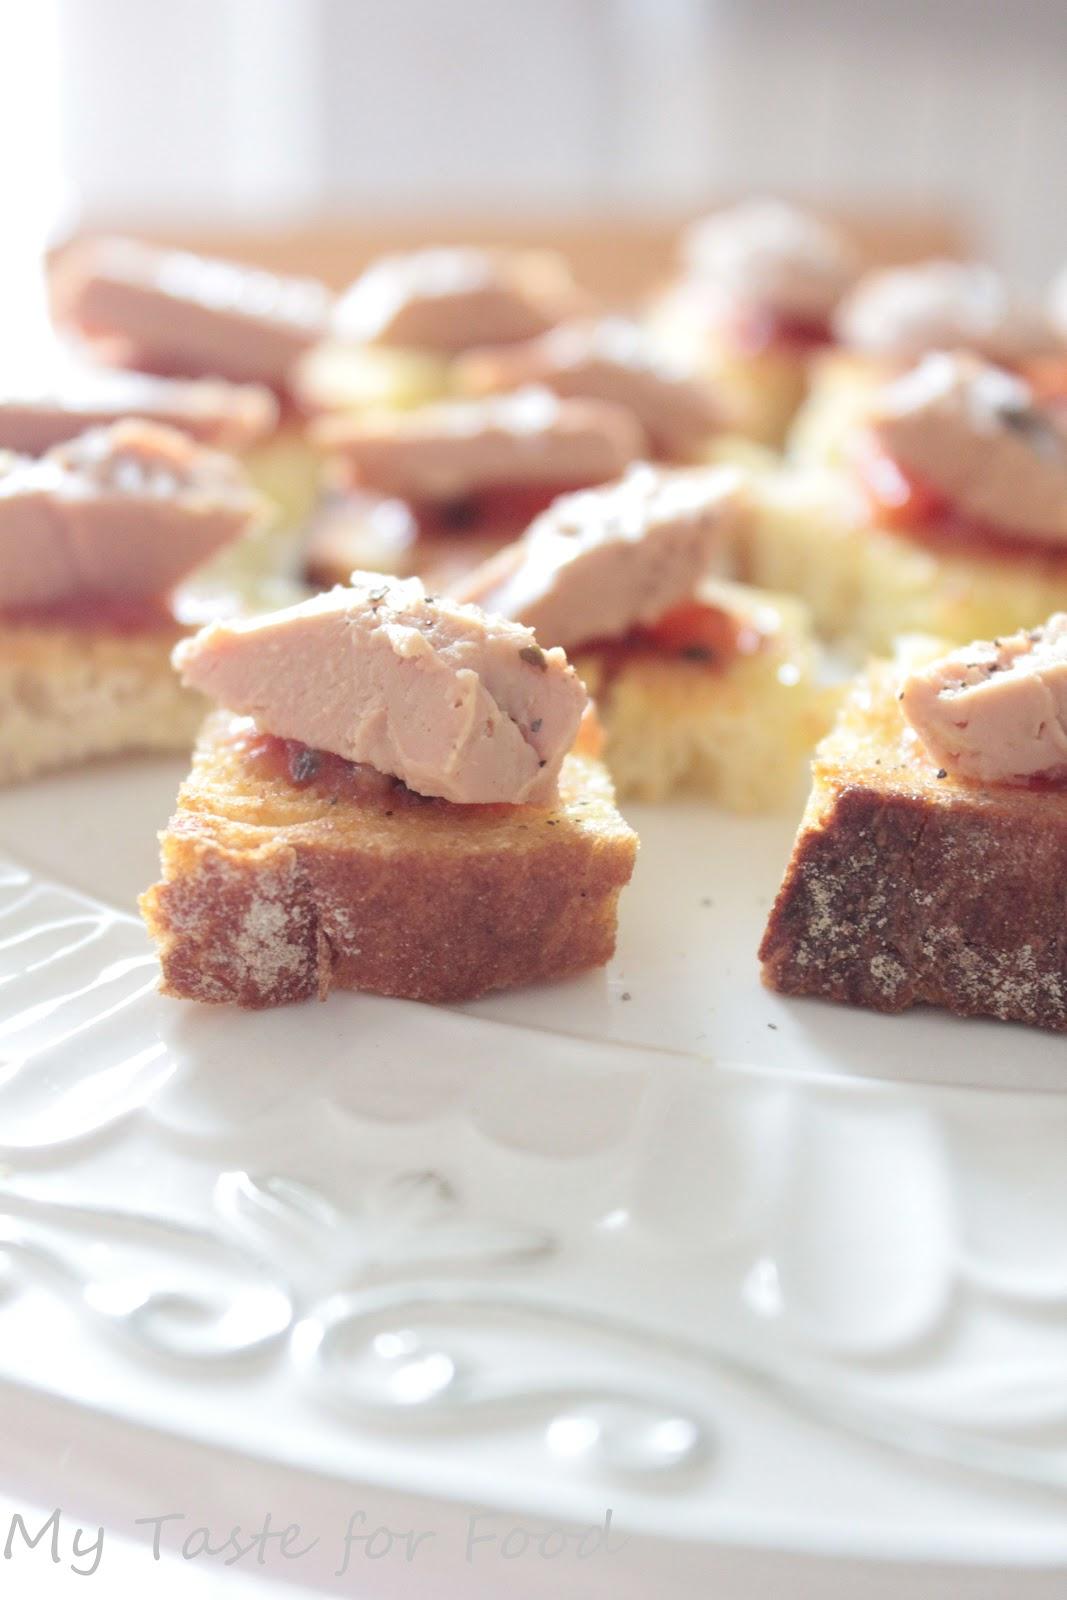 crostini al foie gras chutney e sale rosa my taste for food. Black Bedroom Furniture Sets. Home Design Ideas